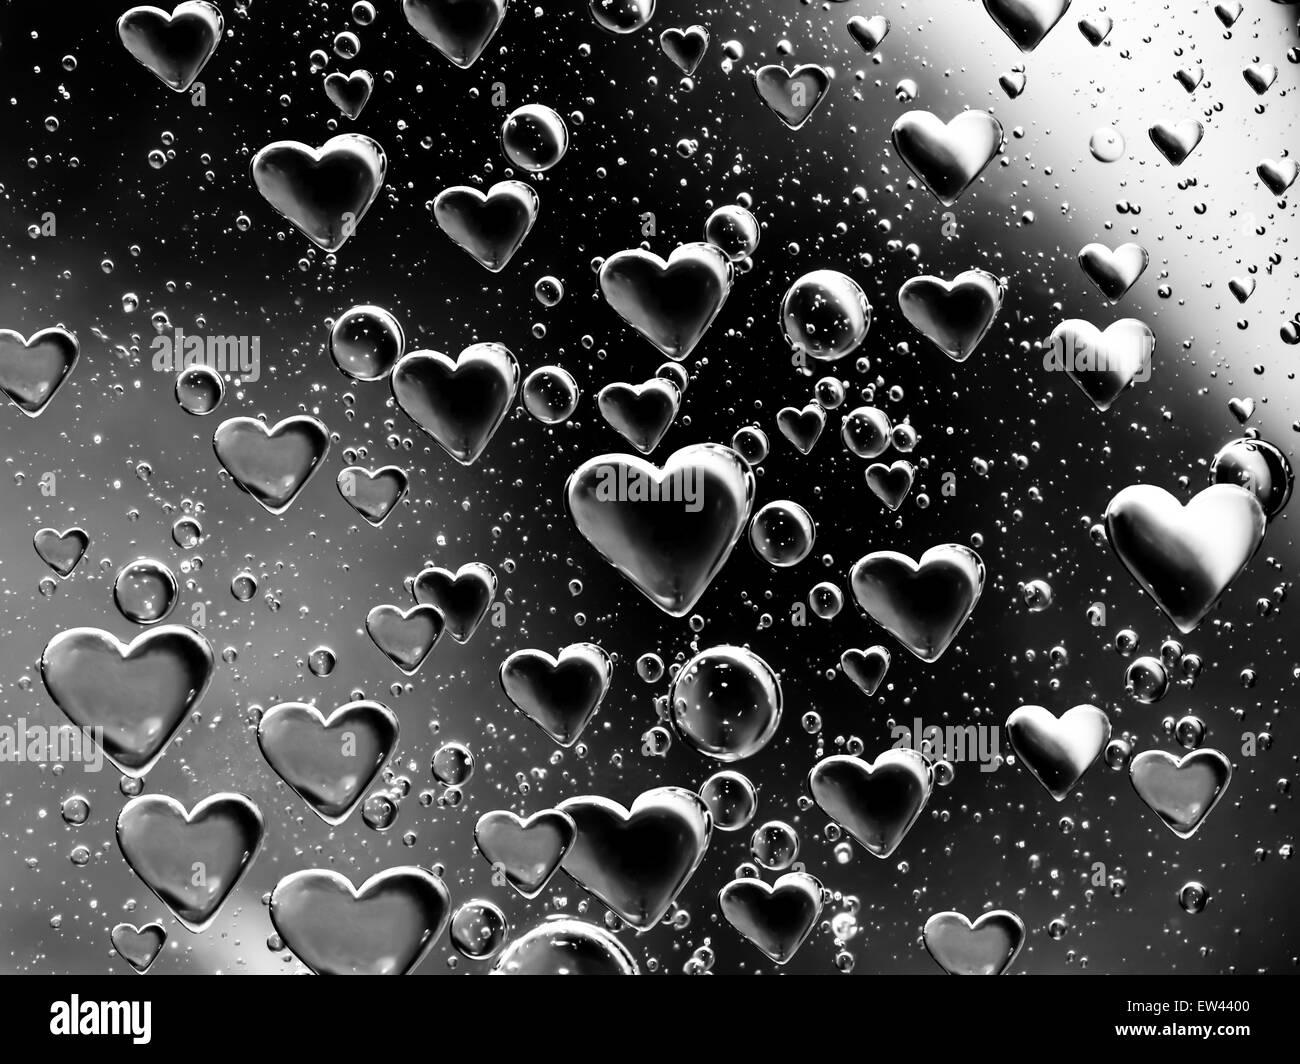 Metallic air bubbles shaped like hearts - Stock Image